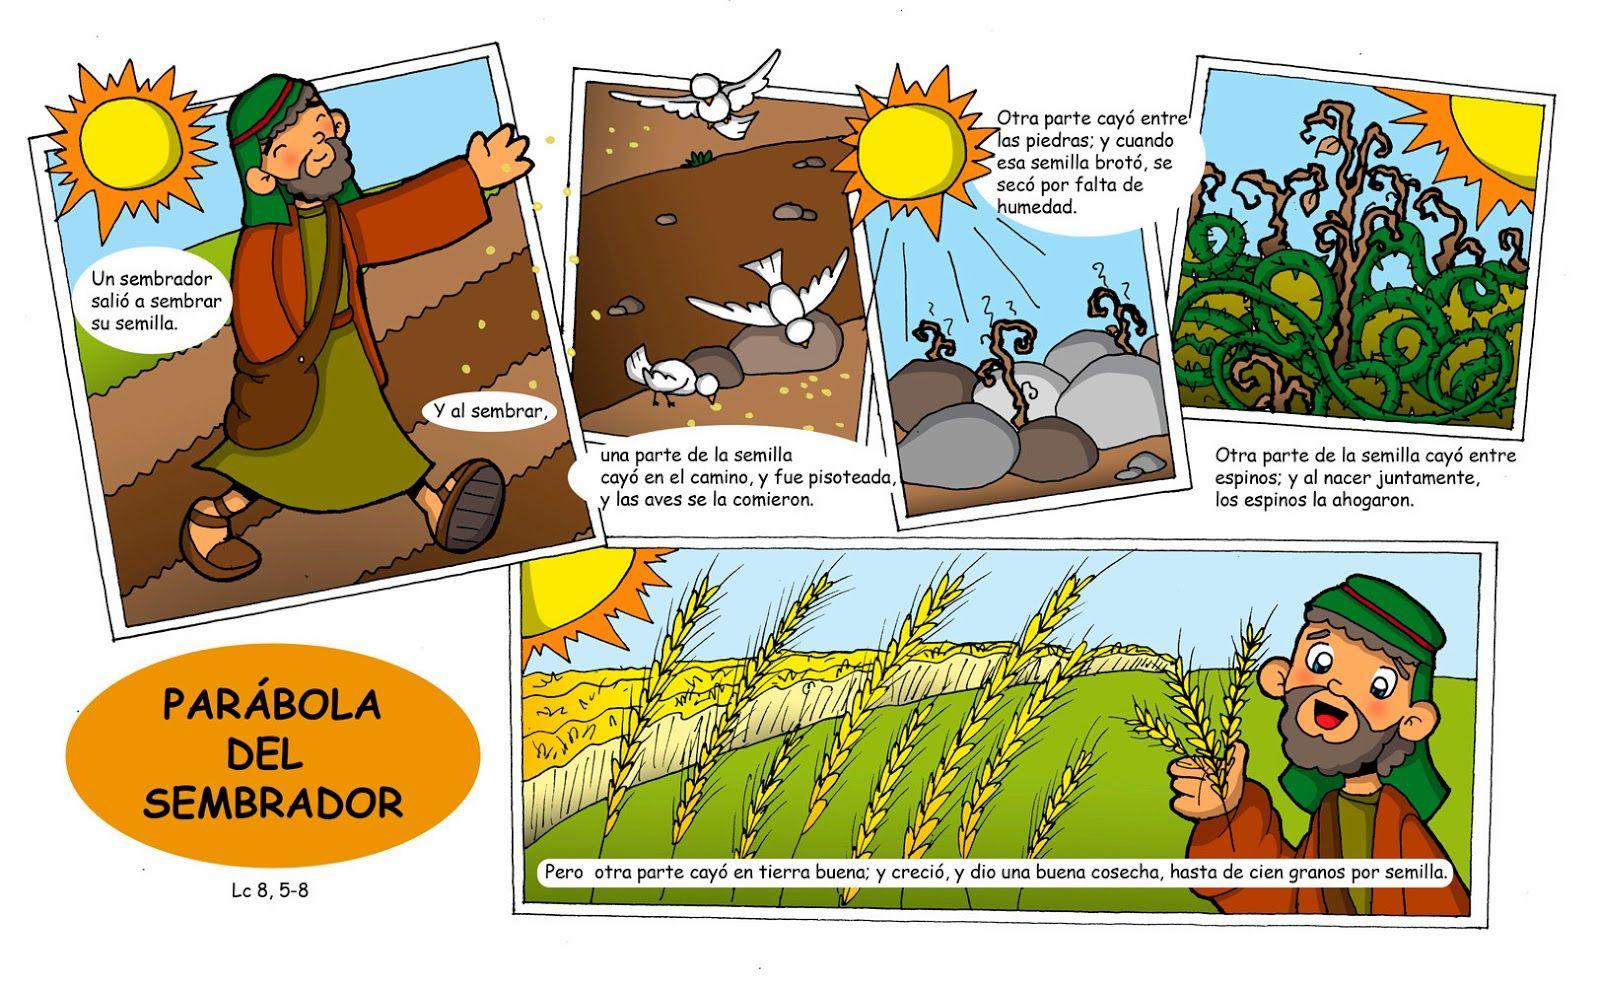 Resultado de imagen de bible video parabola del sembrador